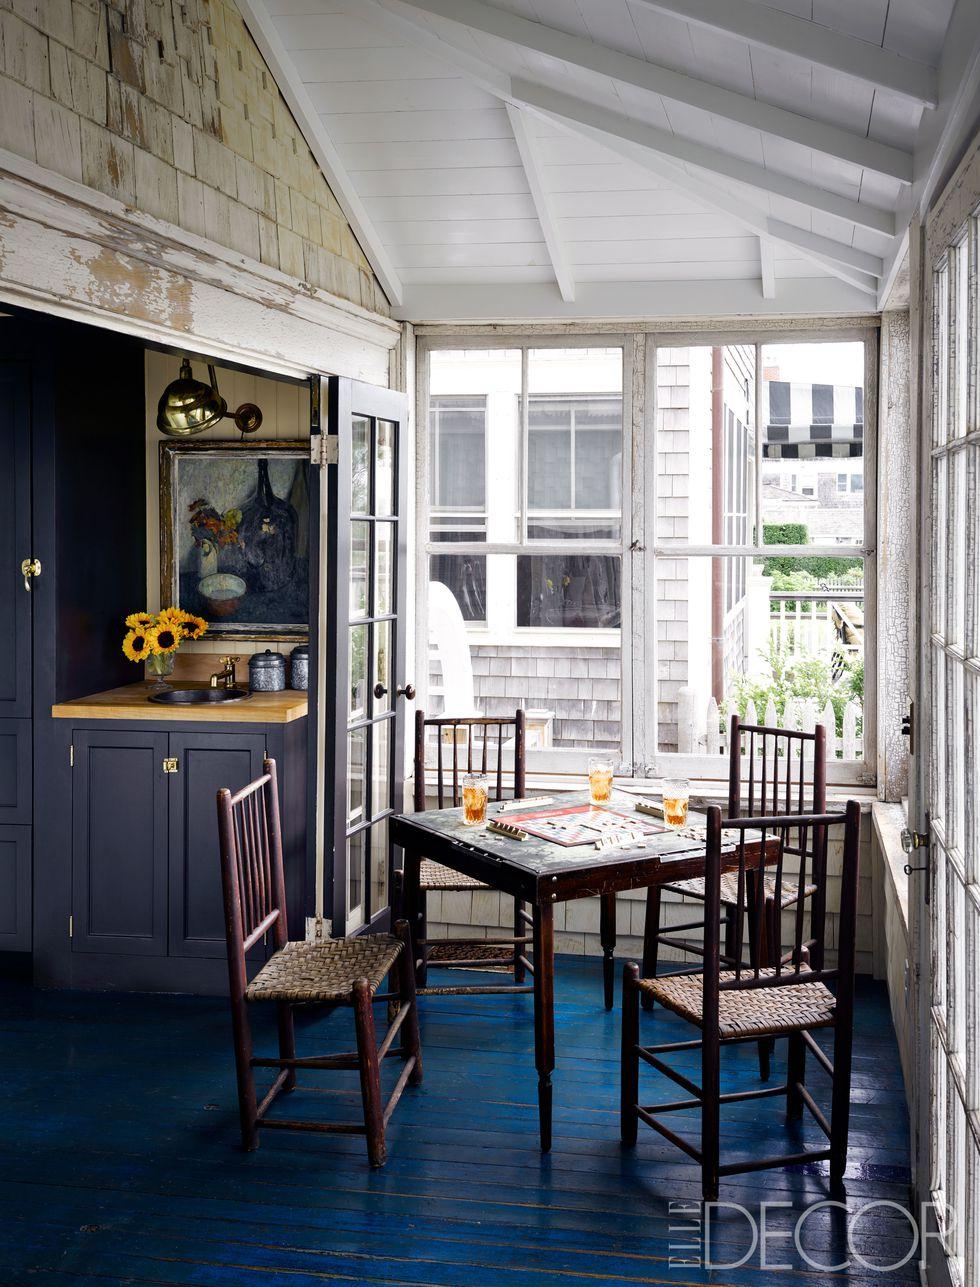 cape cod cottage, small kitchen, farrow & ball paint, antique stove